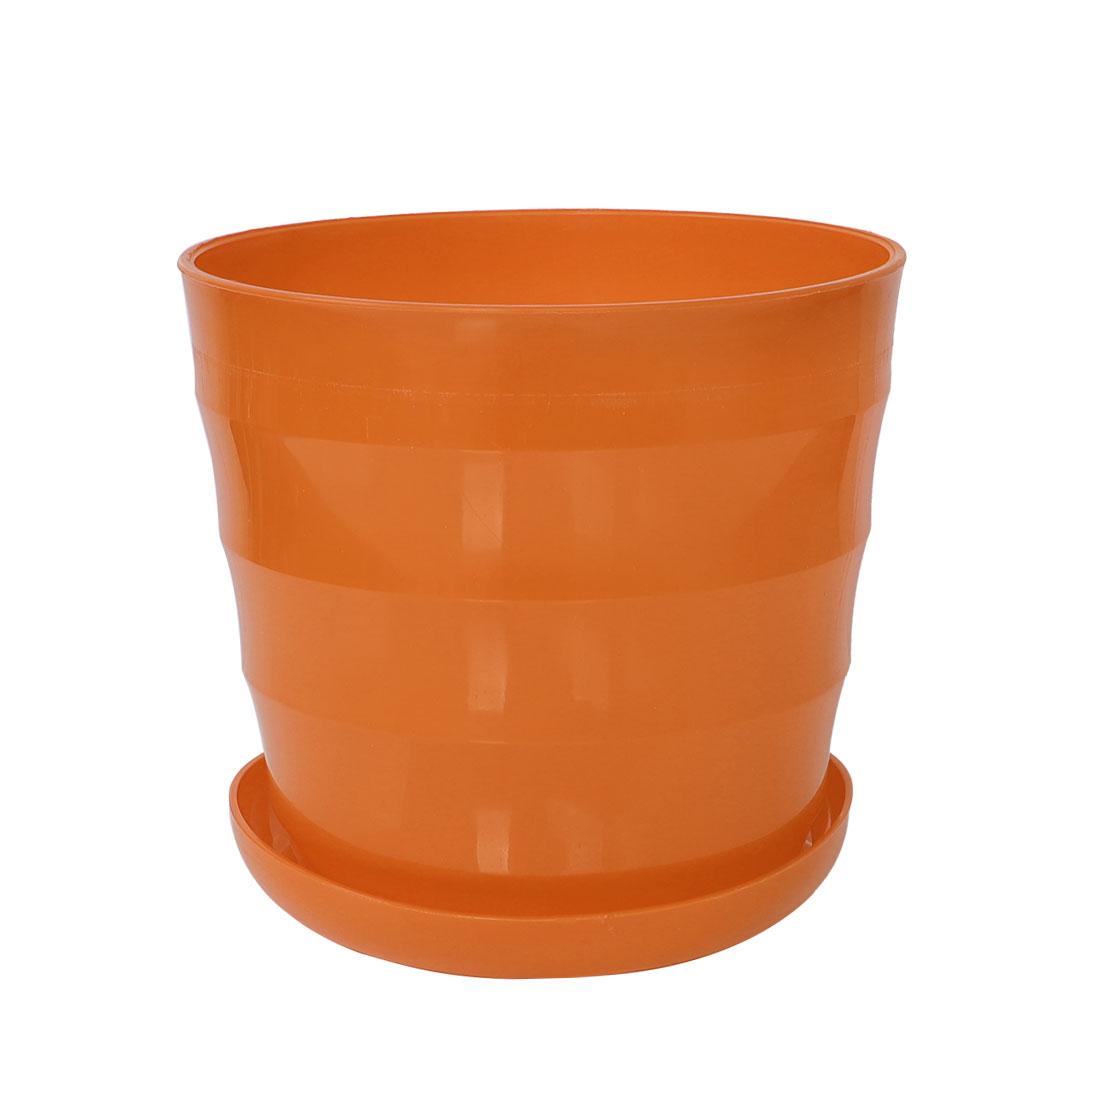 Home Garden Office Plastic Round Plant Planter Holder Flower Pot Orange